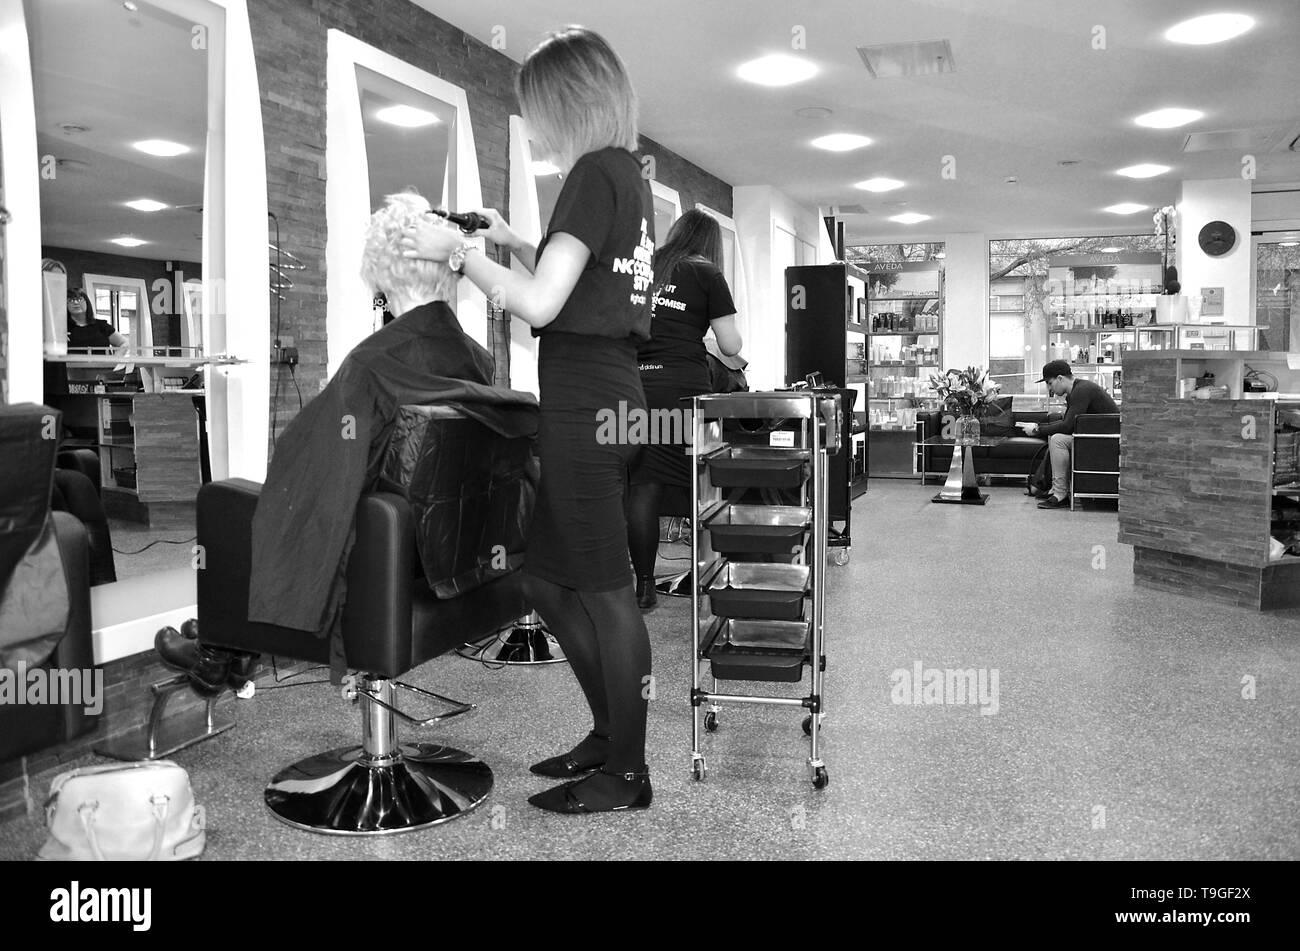 hair and beauty salon - Stock Image